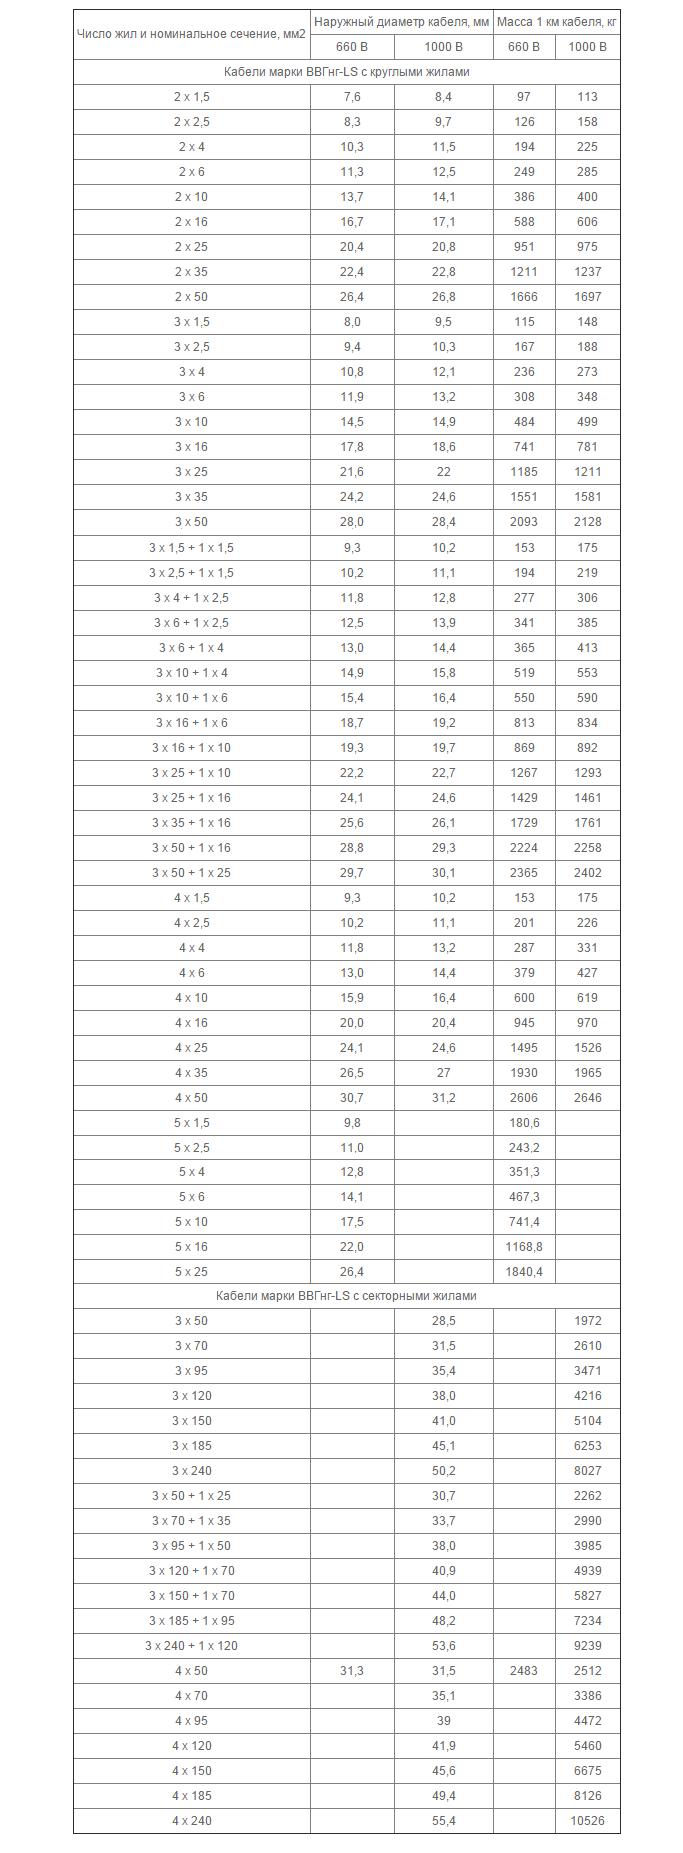 Таблица характеристик кабеля ВВГ